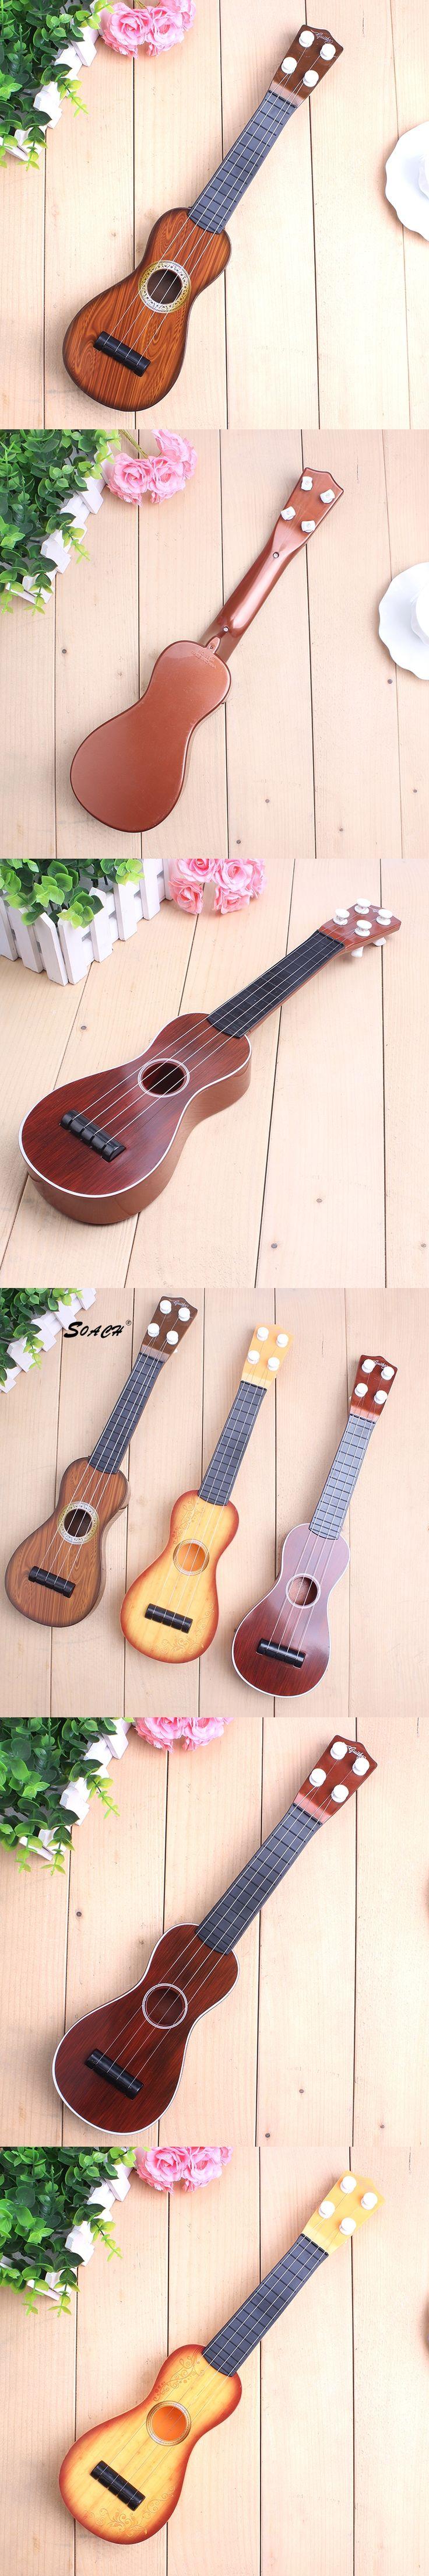 SOACH Children learn Ukulele Soprano Sapele 12 Ukulele Guitar Small Guitar Ukelele Strings Musical Instruments